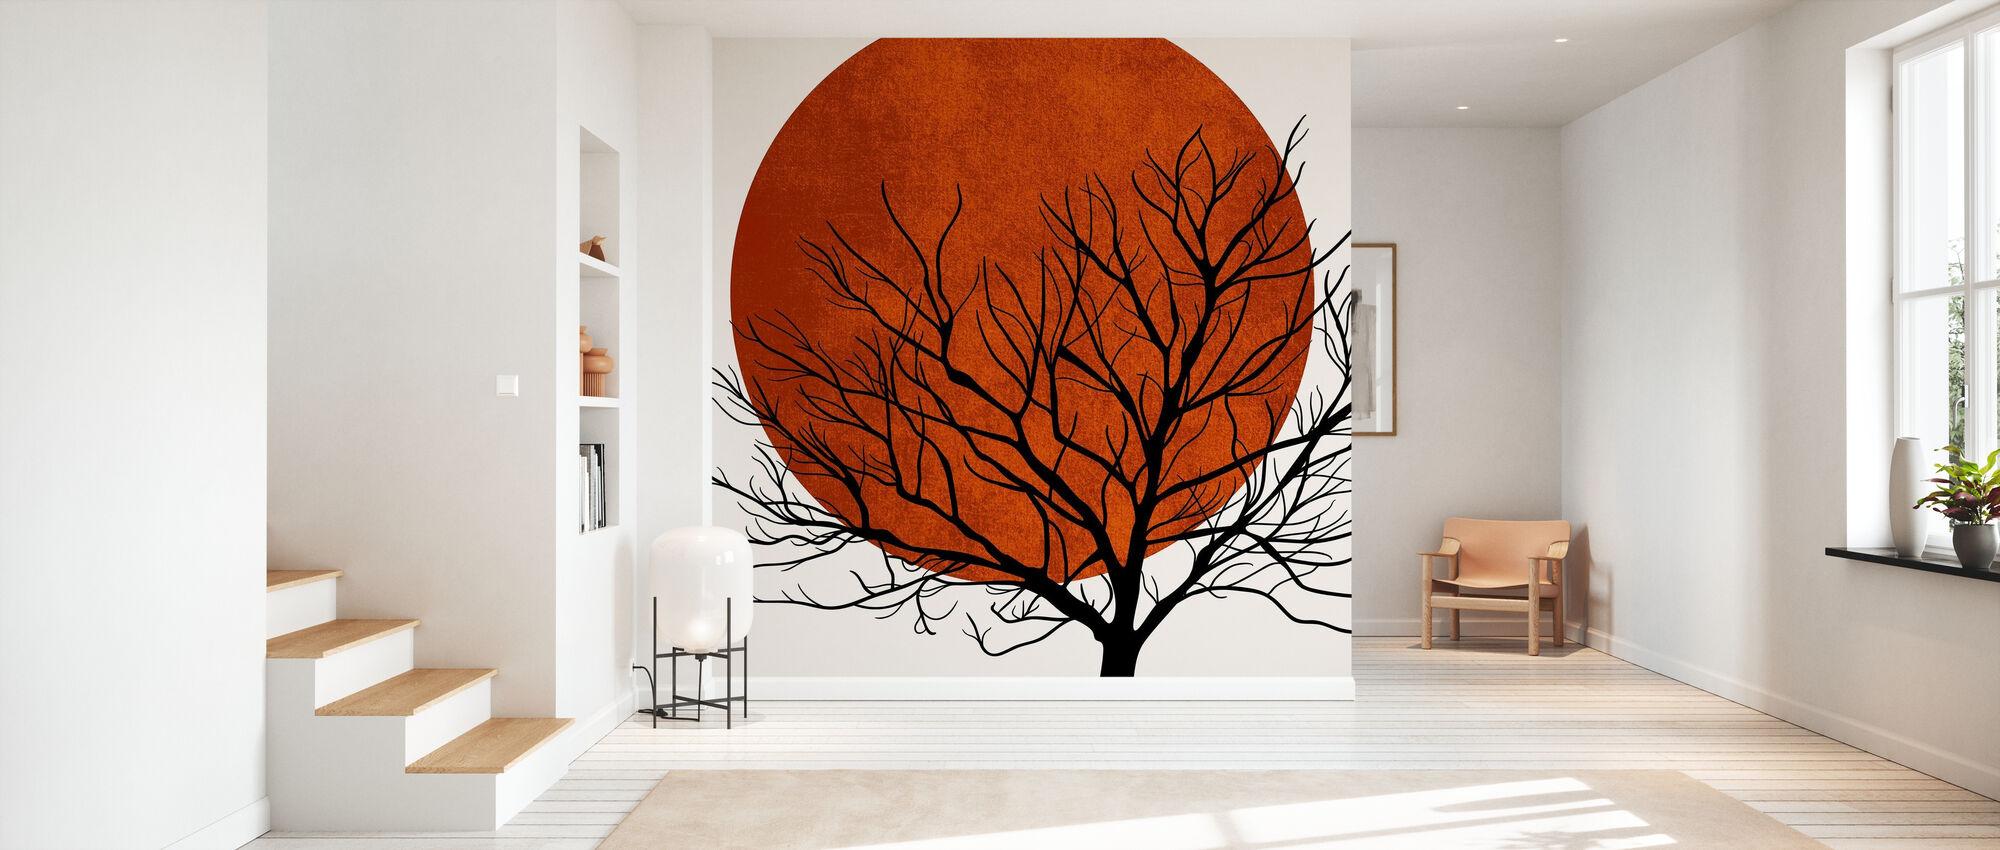 Warm Winter - Wallpaper - Hallway